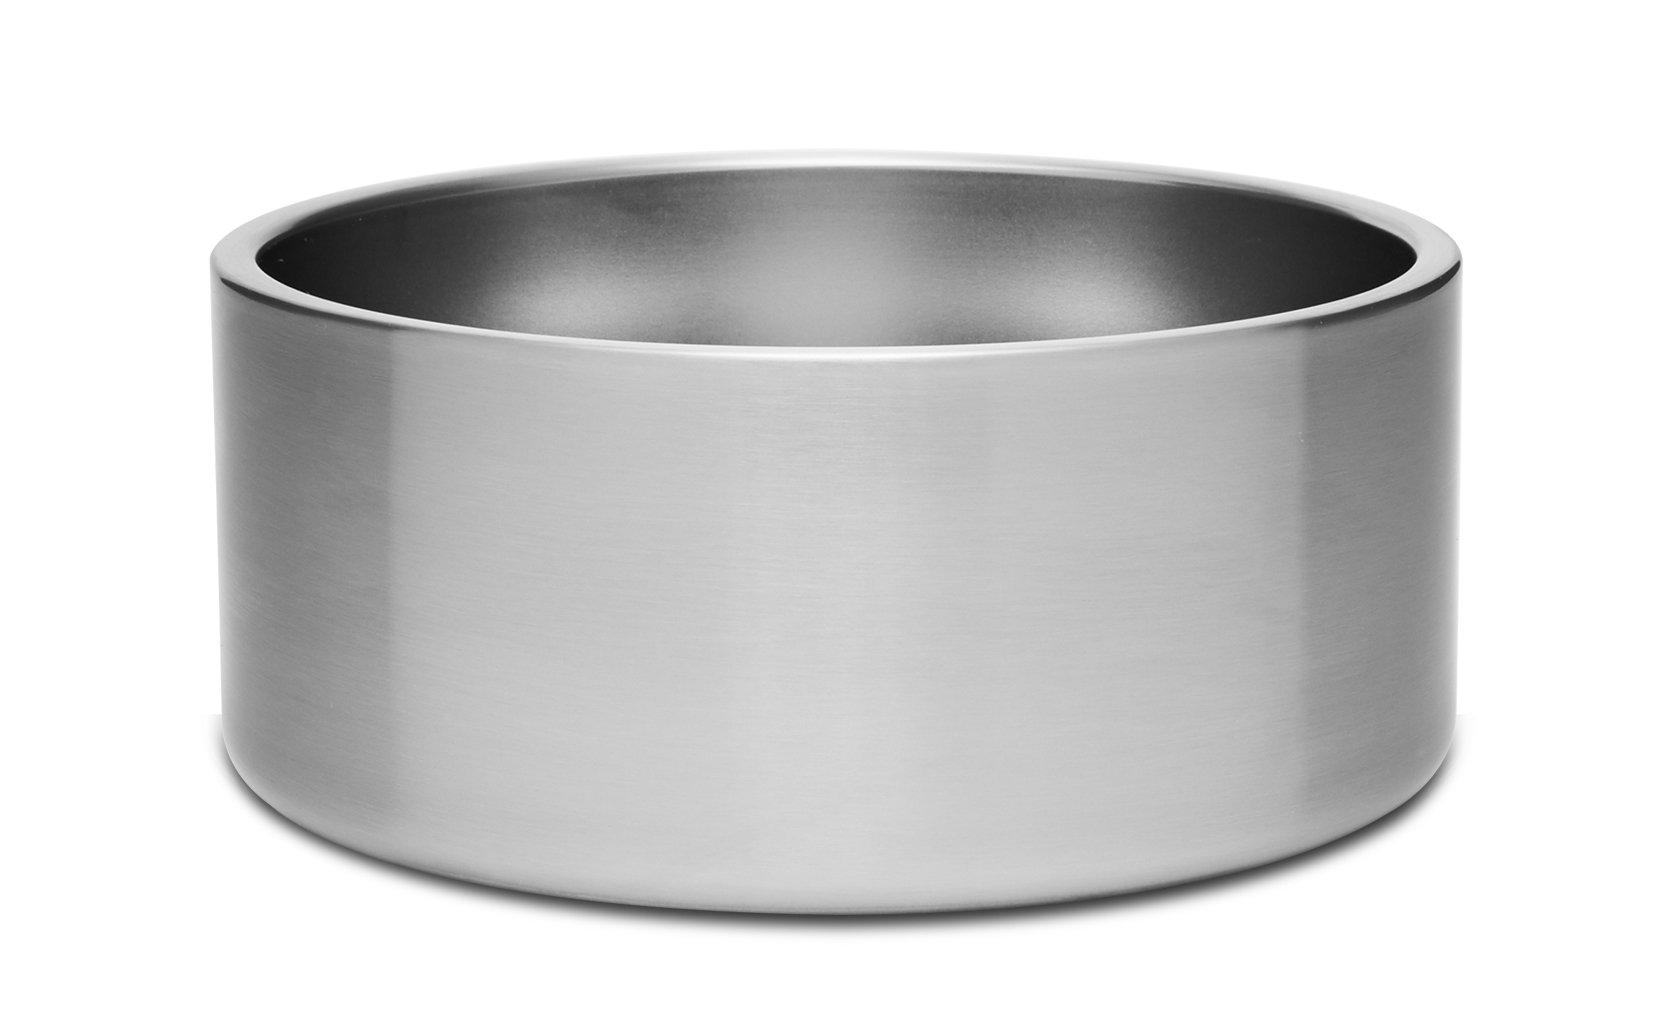 180568-Boomer-Dog-Bowl-Website-Assets-Studio-Boomer-8-Dog-Bowl-Stainless-Back-1680x1024-1551071085312